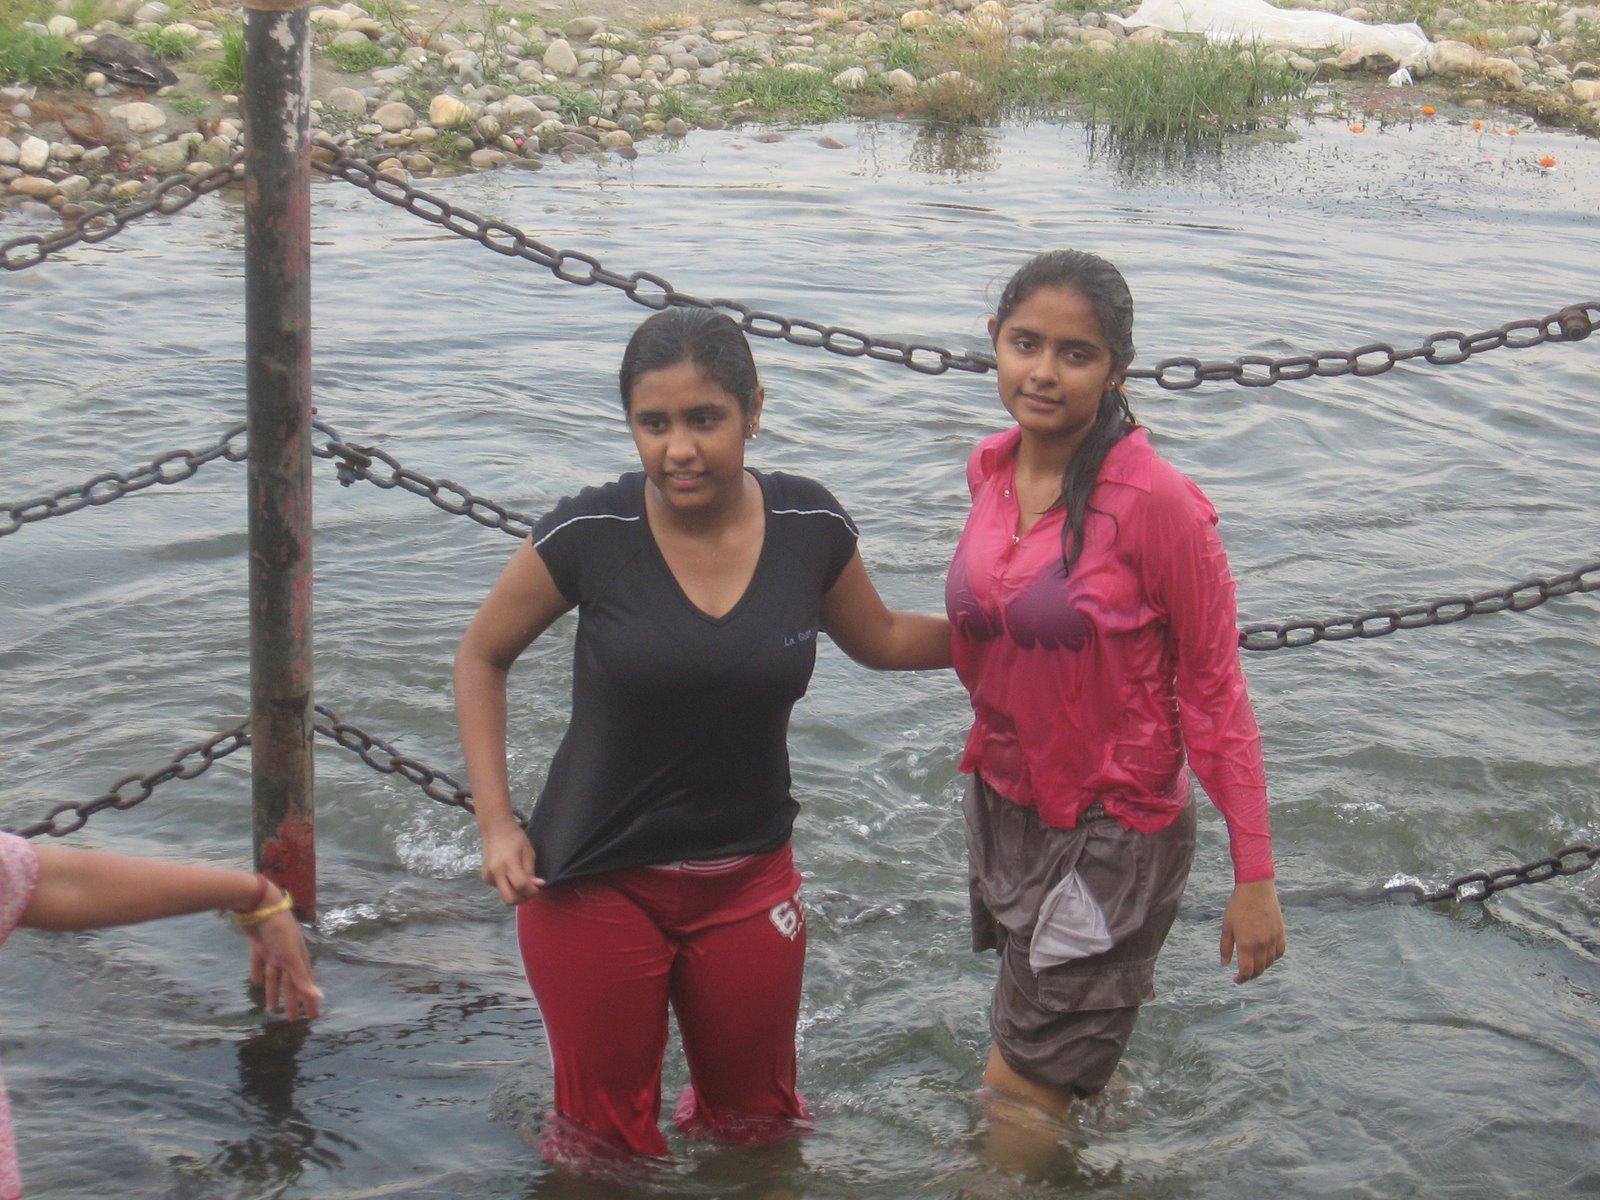 Image Indian Women Girls Bathing In River Real Life Image